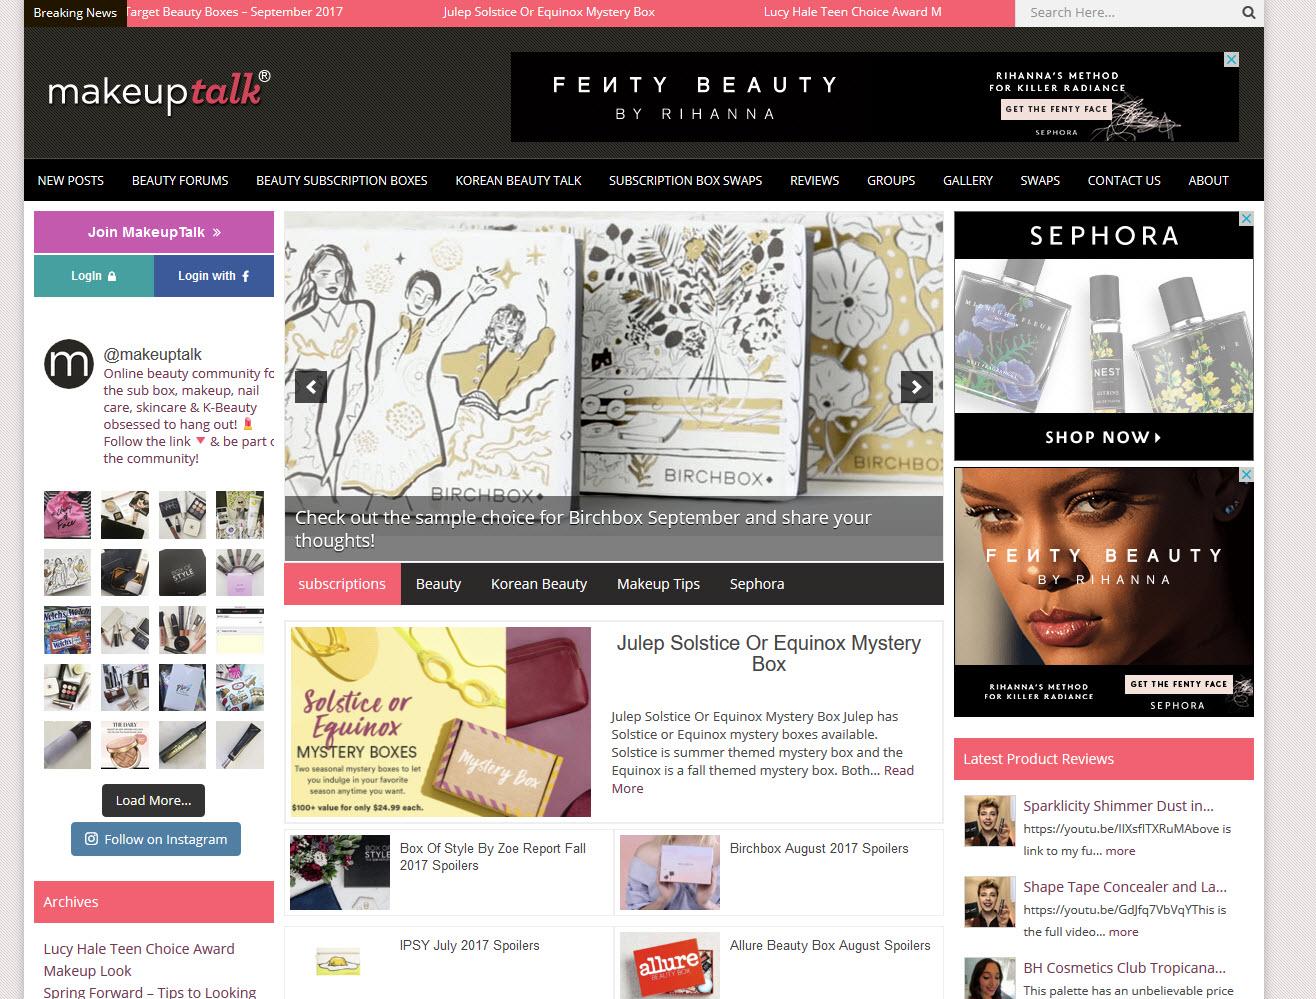 MakeupTalk.com